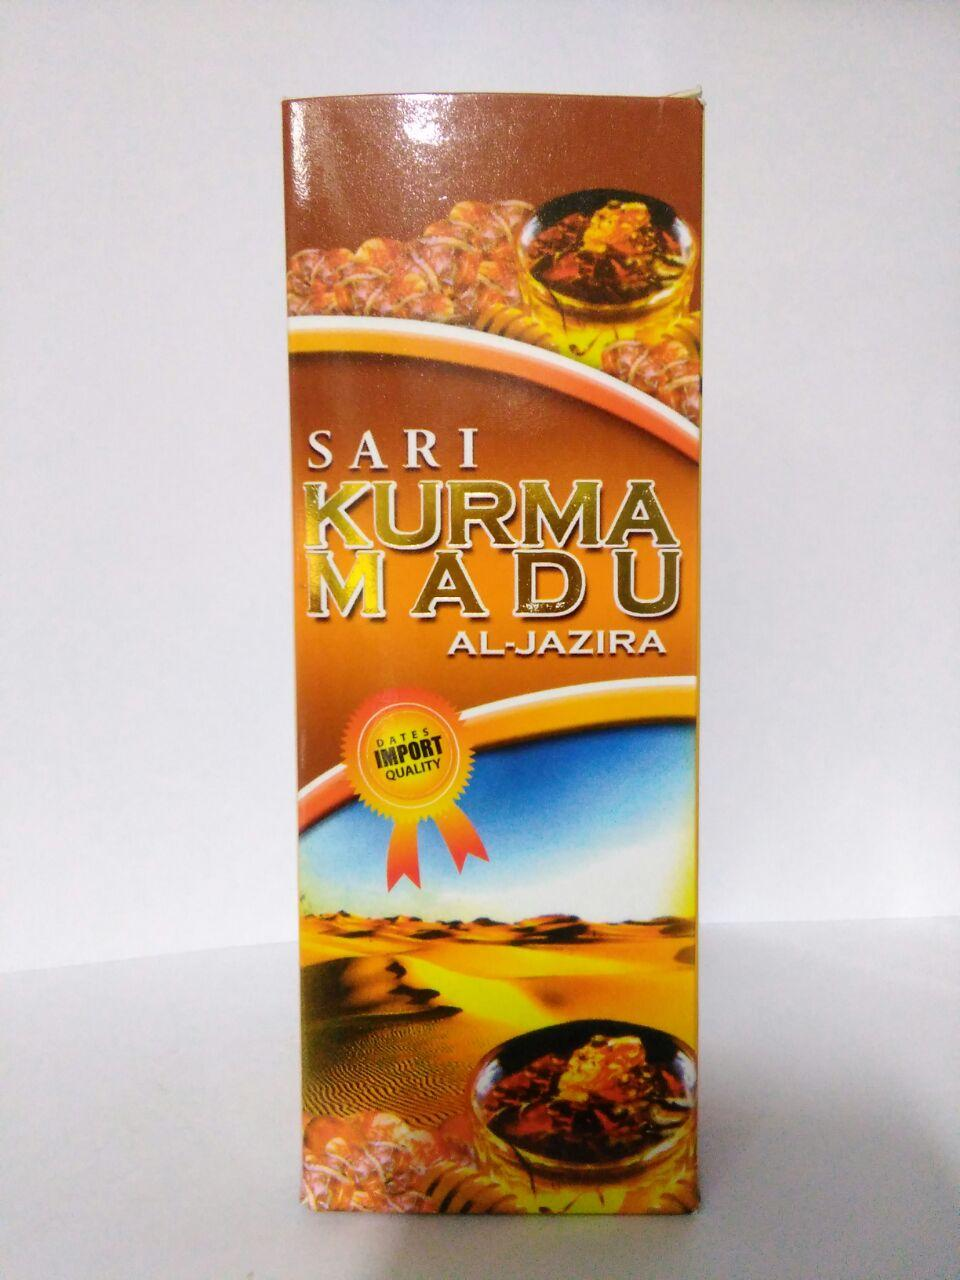 Harga Jual Sari Kurma Madu Anak Kids Platinum Al Jazira 10 In 1 360 Aljazira Rp 88000 2 Paket Original